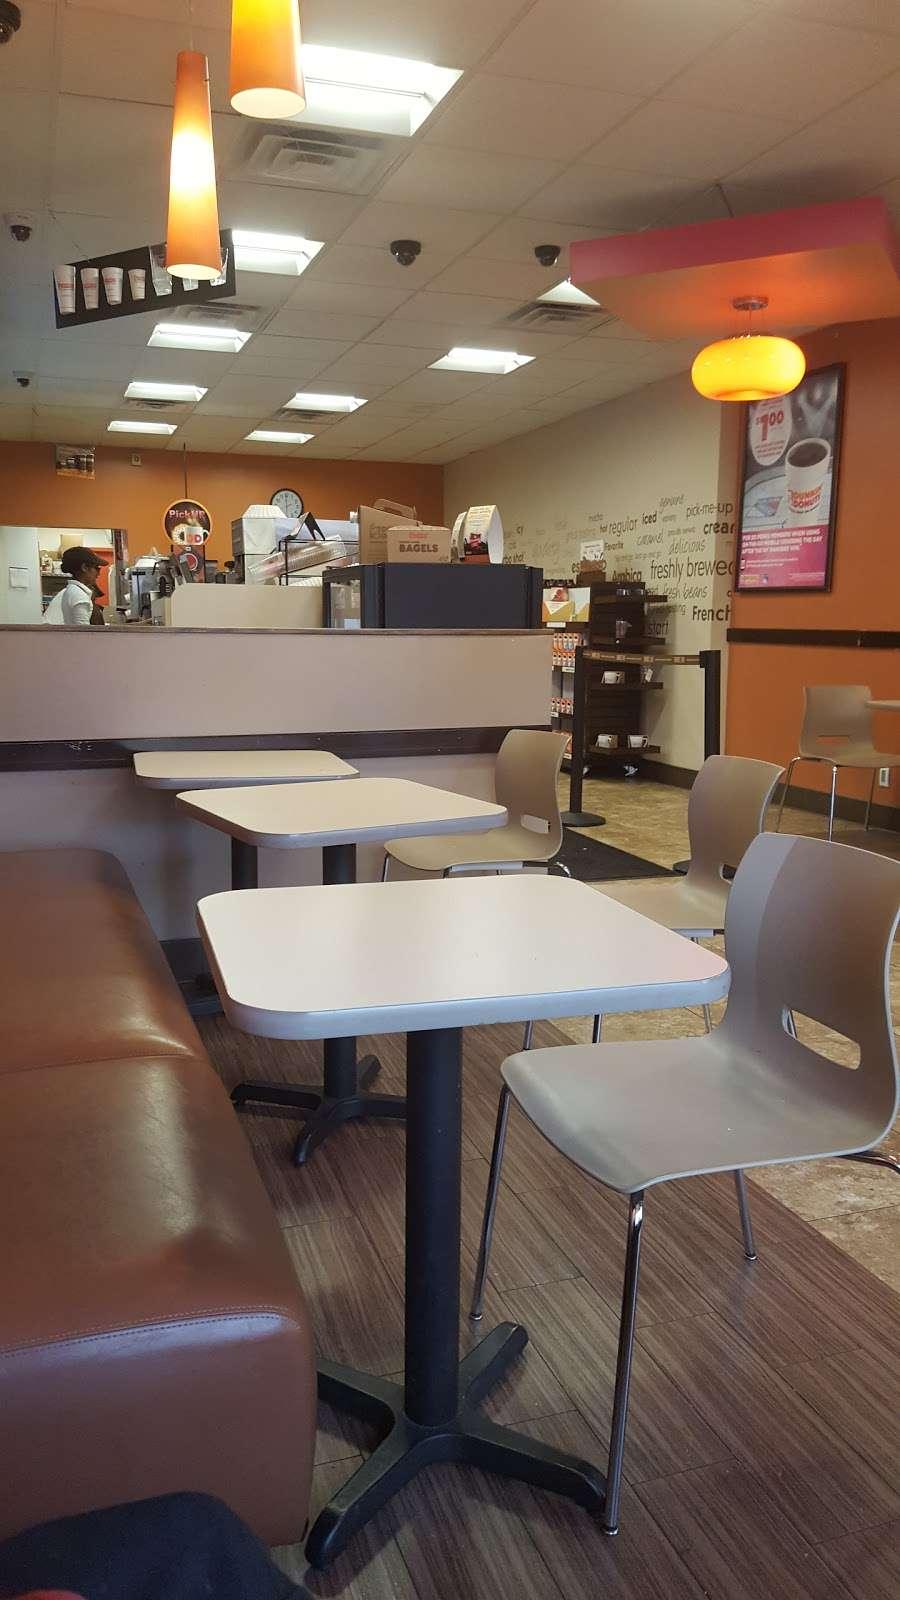 Dunkin Donuts - cafe  | Photo 5 of 10 | Address: 122-17 Liberty Ave, South Richmond Hill, NY 11419, USA | Phone: (718) 848-4874